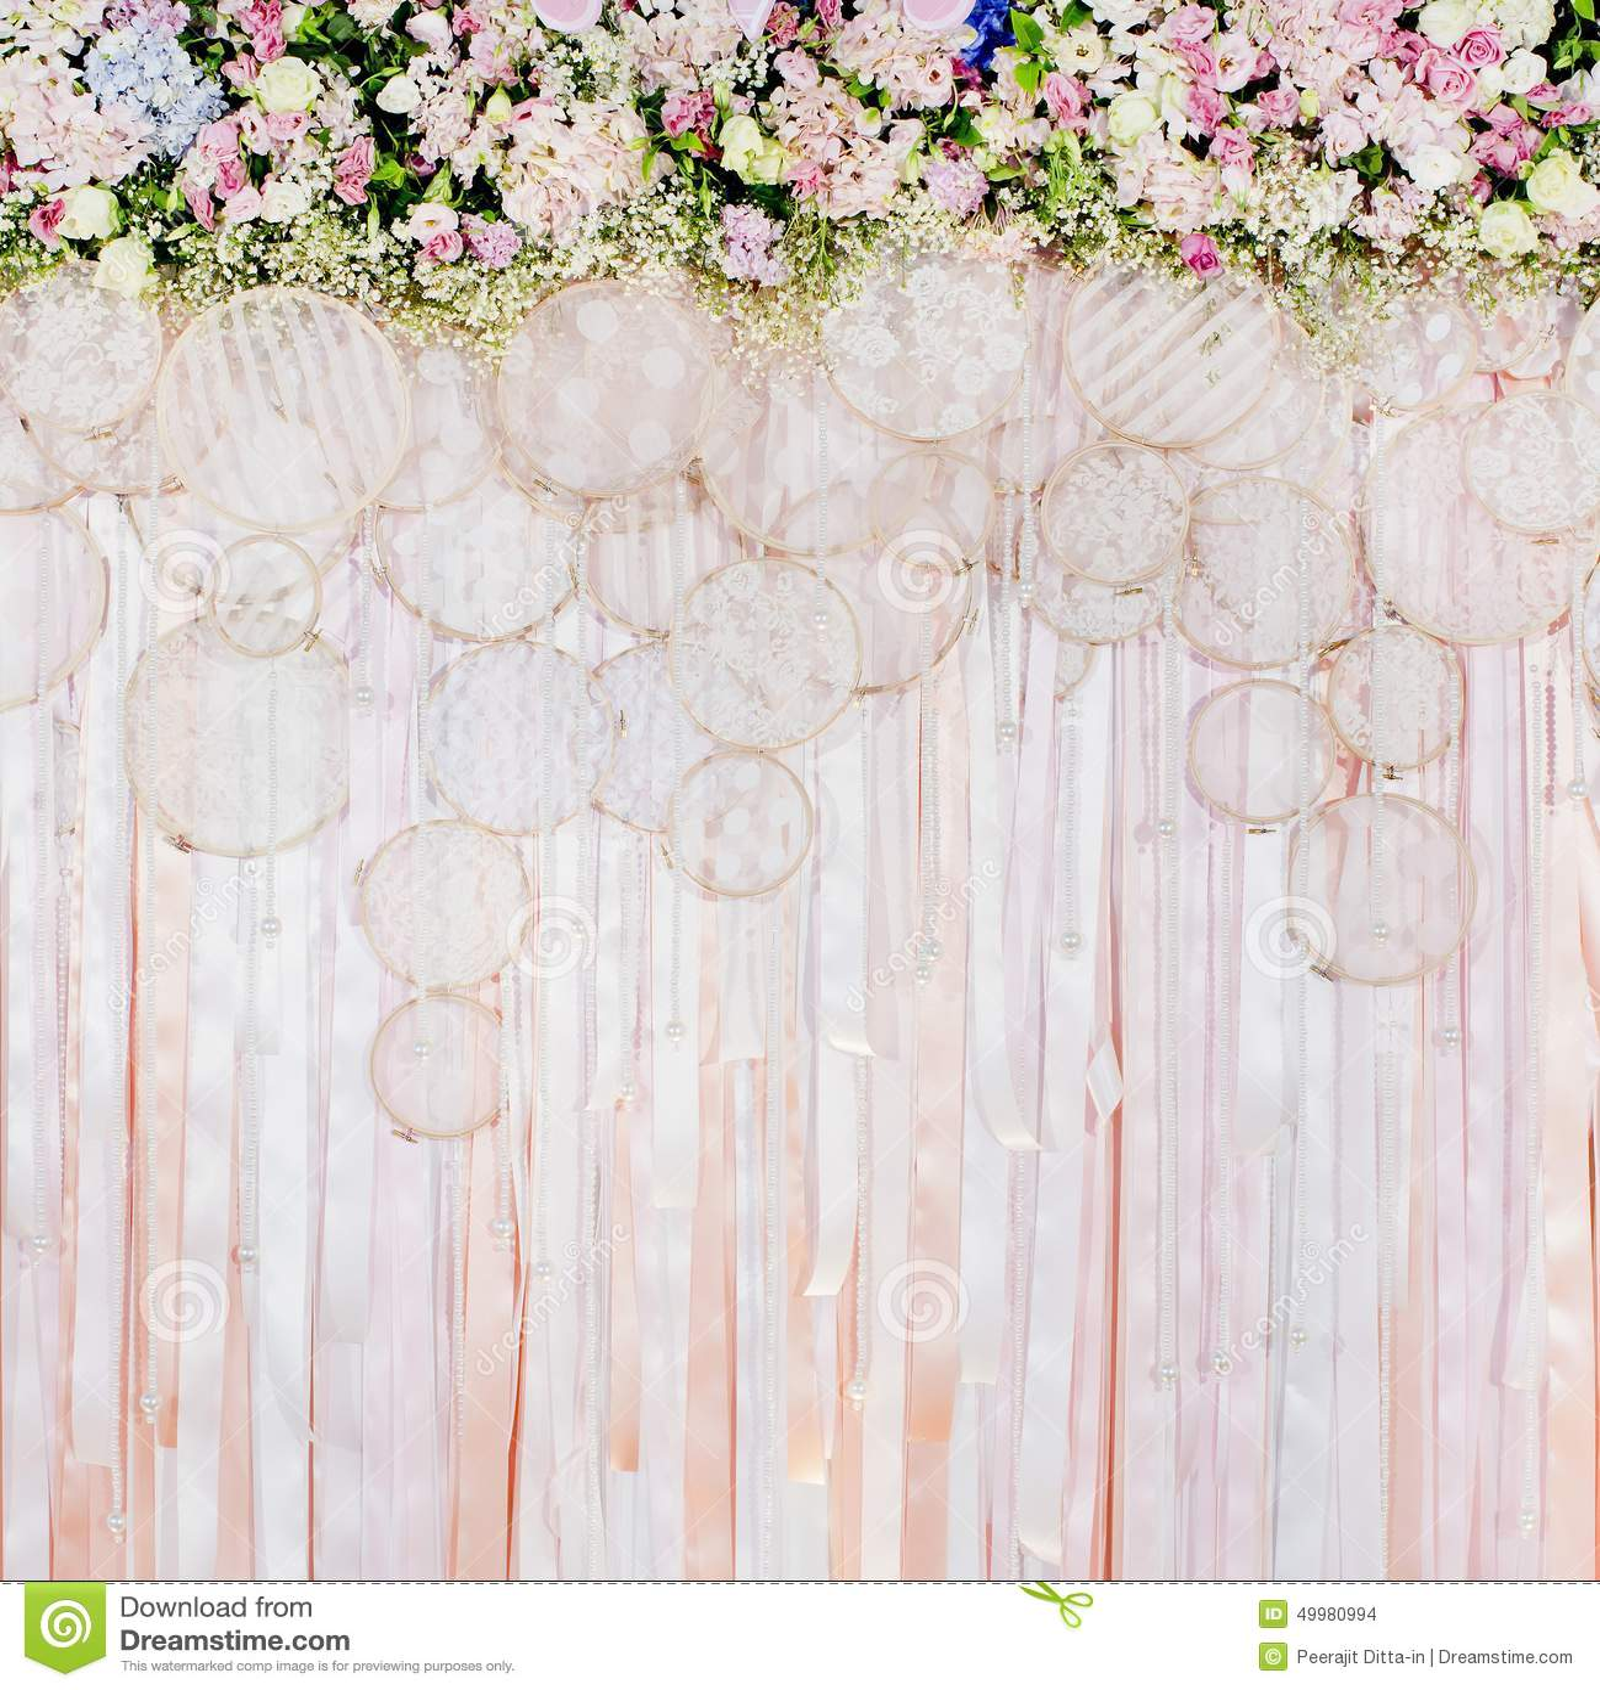 Wedding Flower Background: Beautiful Flowers Background For Wedding Scene Stock Photo